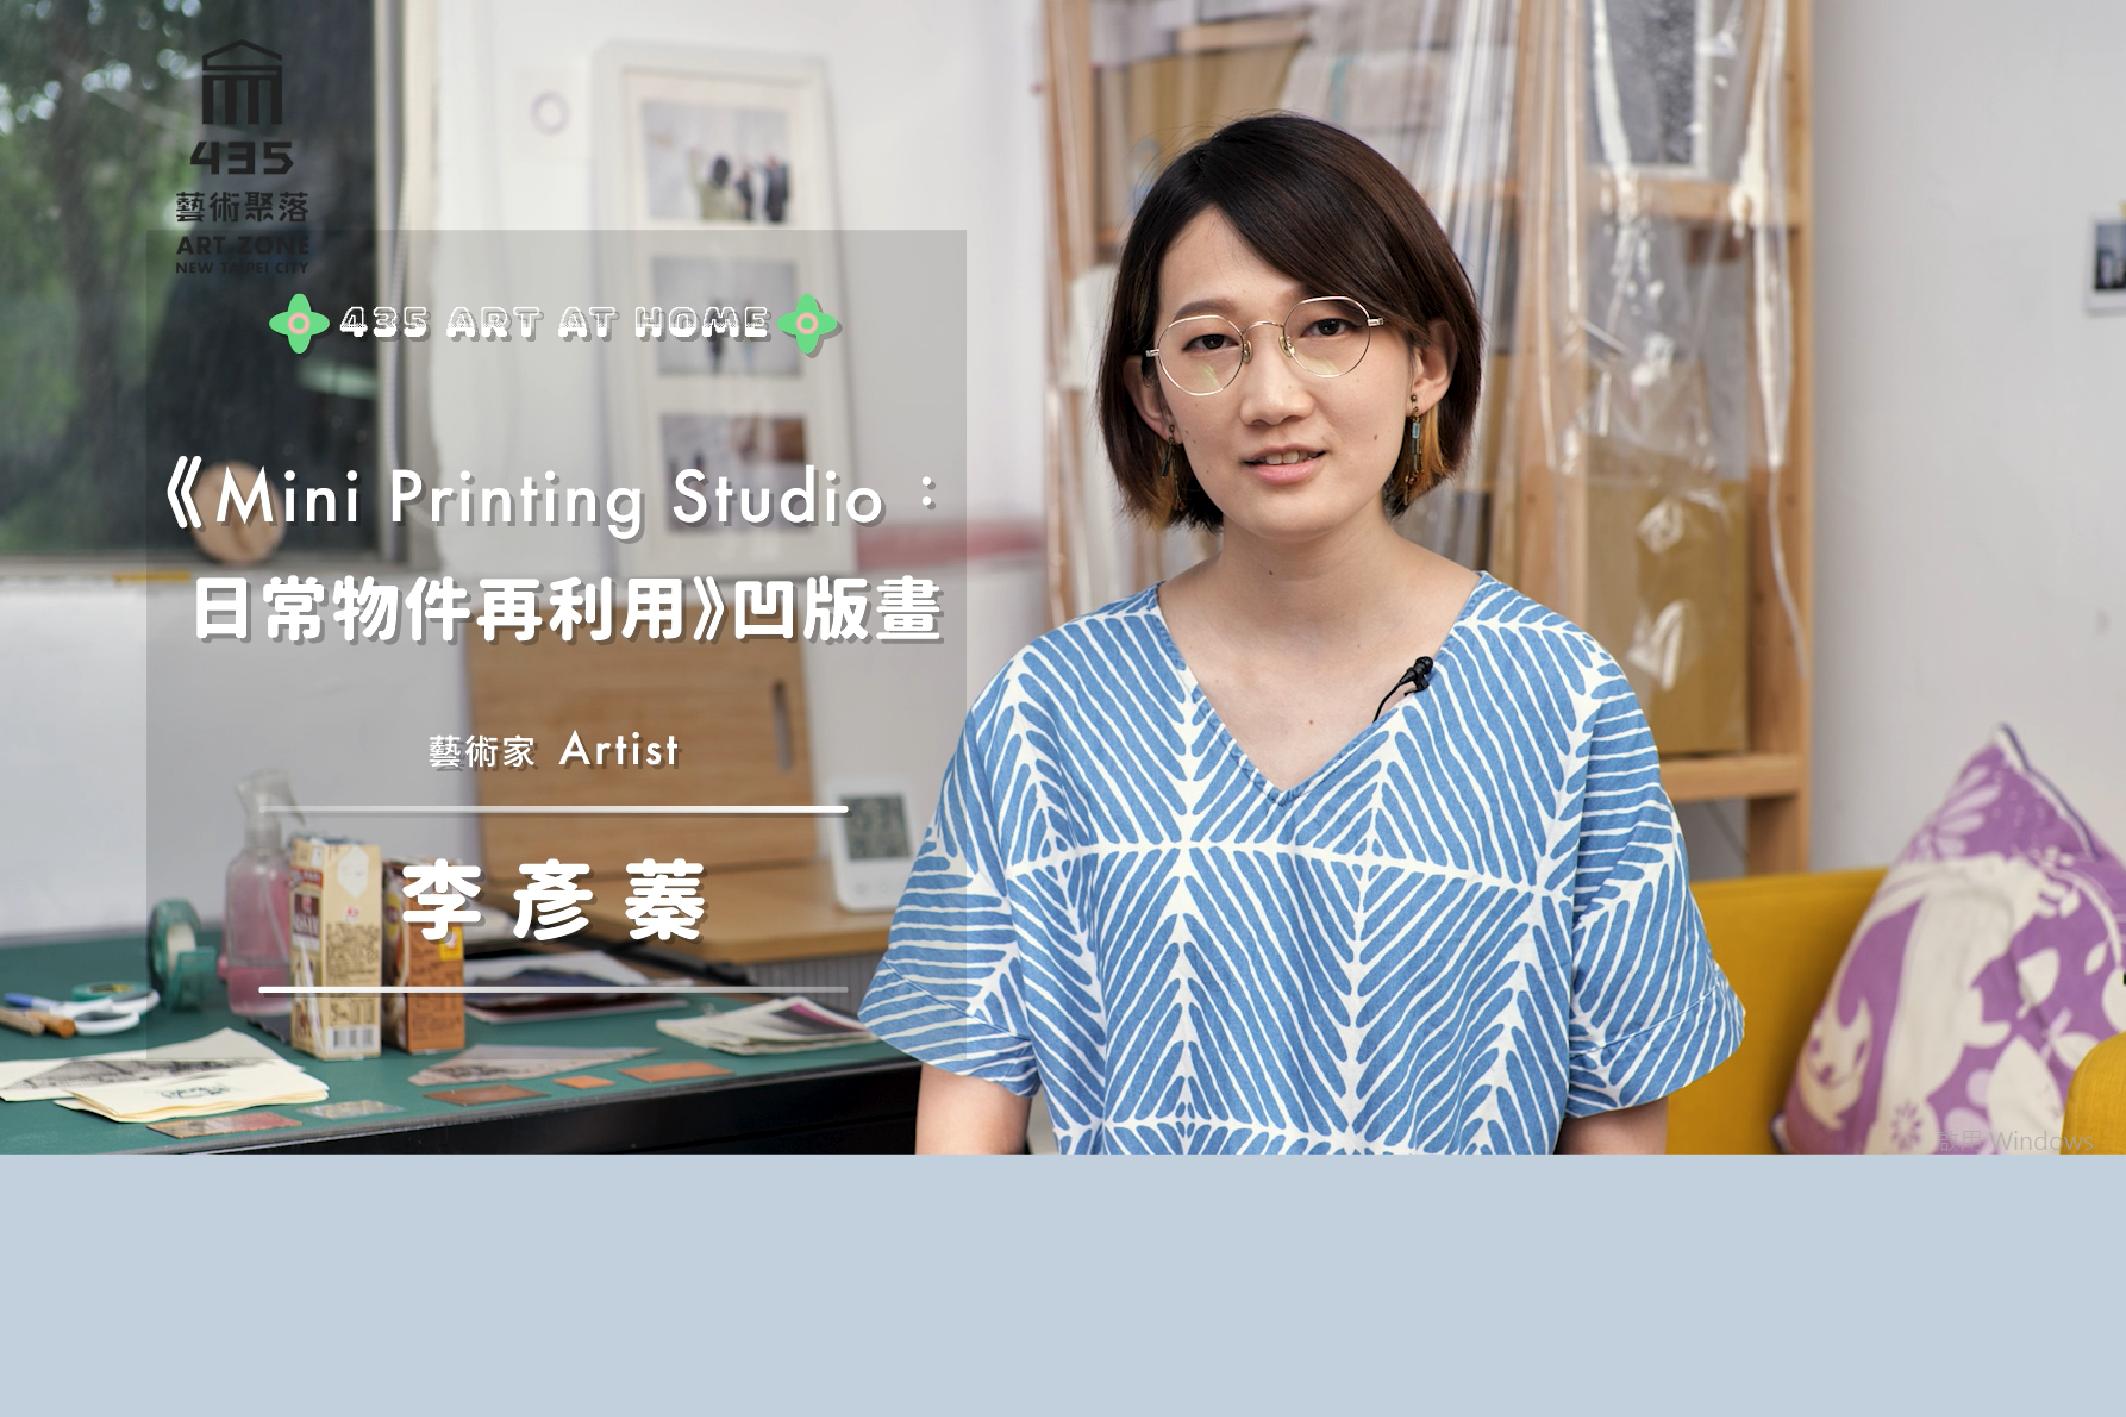 【🏠 435 ART AT HOME 🏠】- EP04 李彥蓁 《Mini Printing Studio:日常物件再利用》凹版畫篇